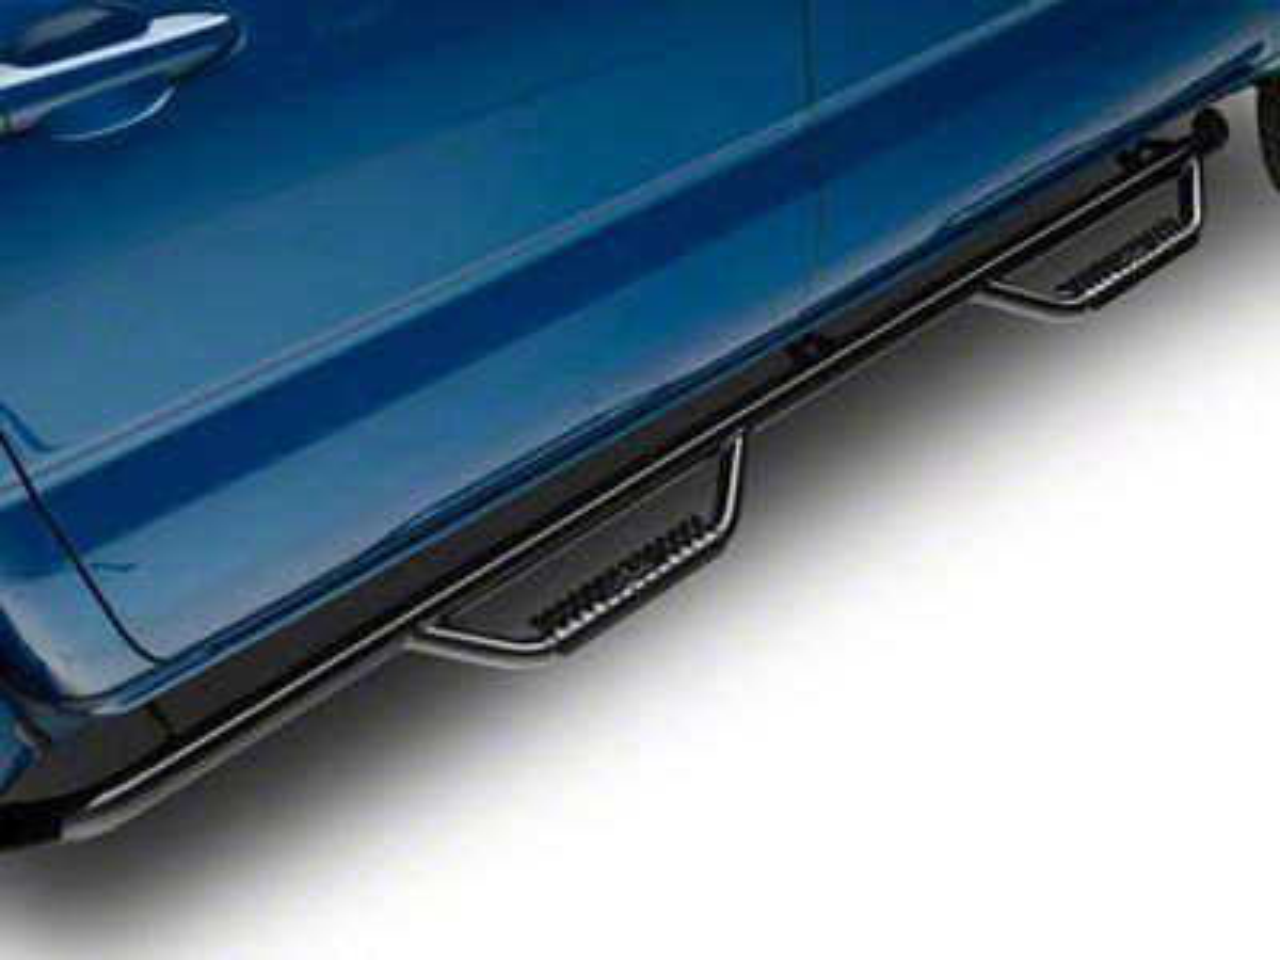 N-Fab Cab Length Nerf Side Step Bars - Gloss Black (16-19 Tacoma Double Cab)